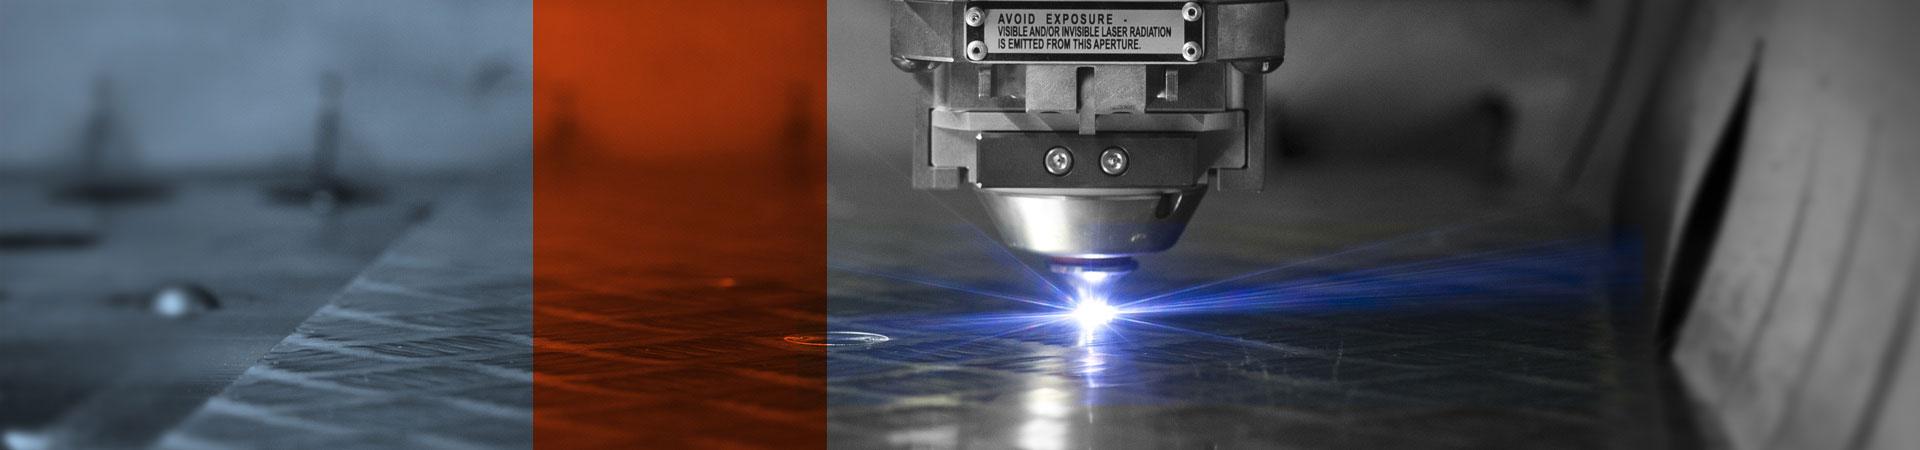 artieres carrosserie atelier decoupe laser